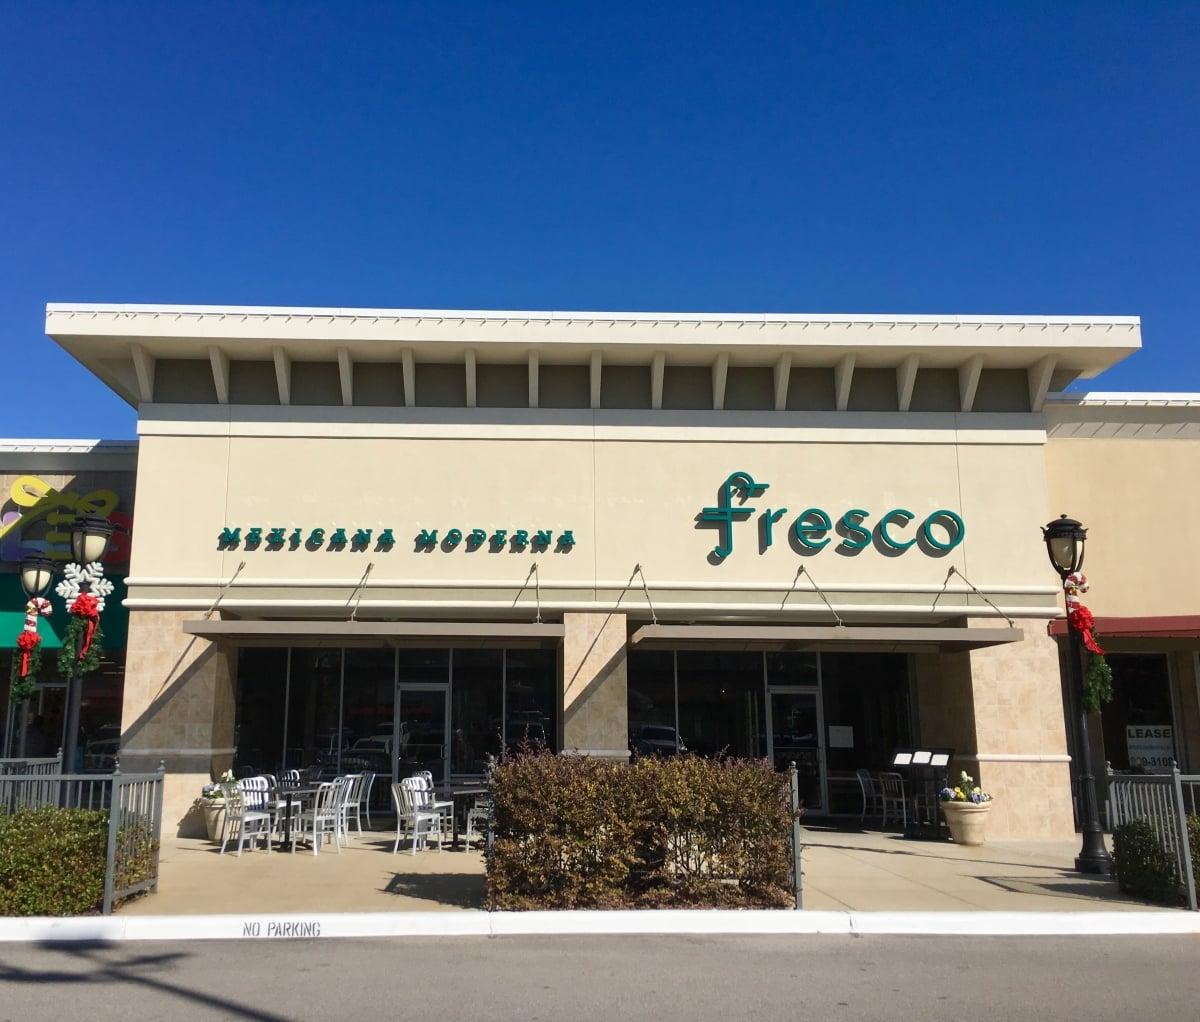 Fresco: Cahaba Height's newest FRESH Mexican restaurant